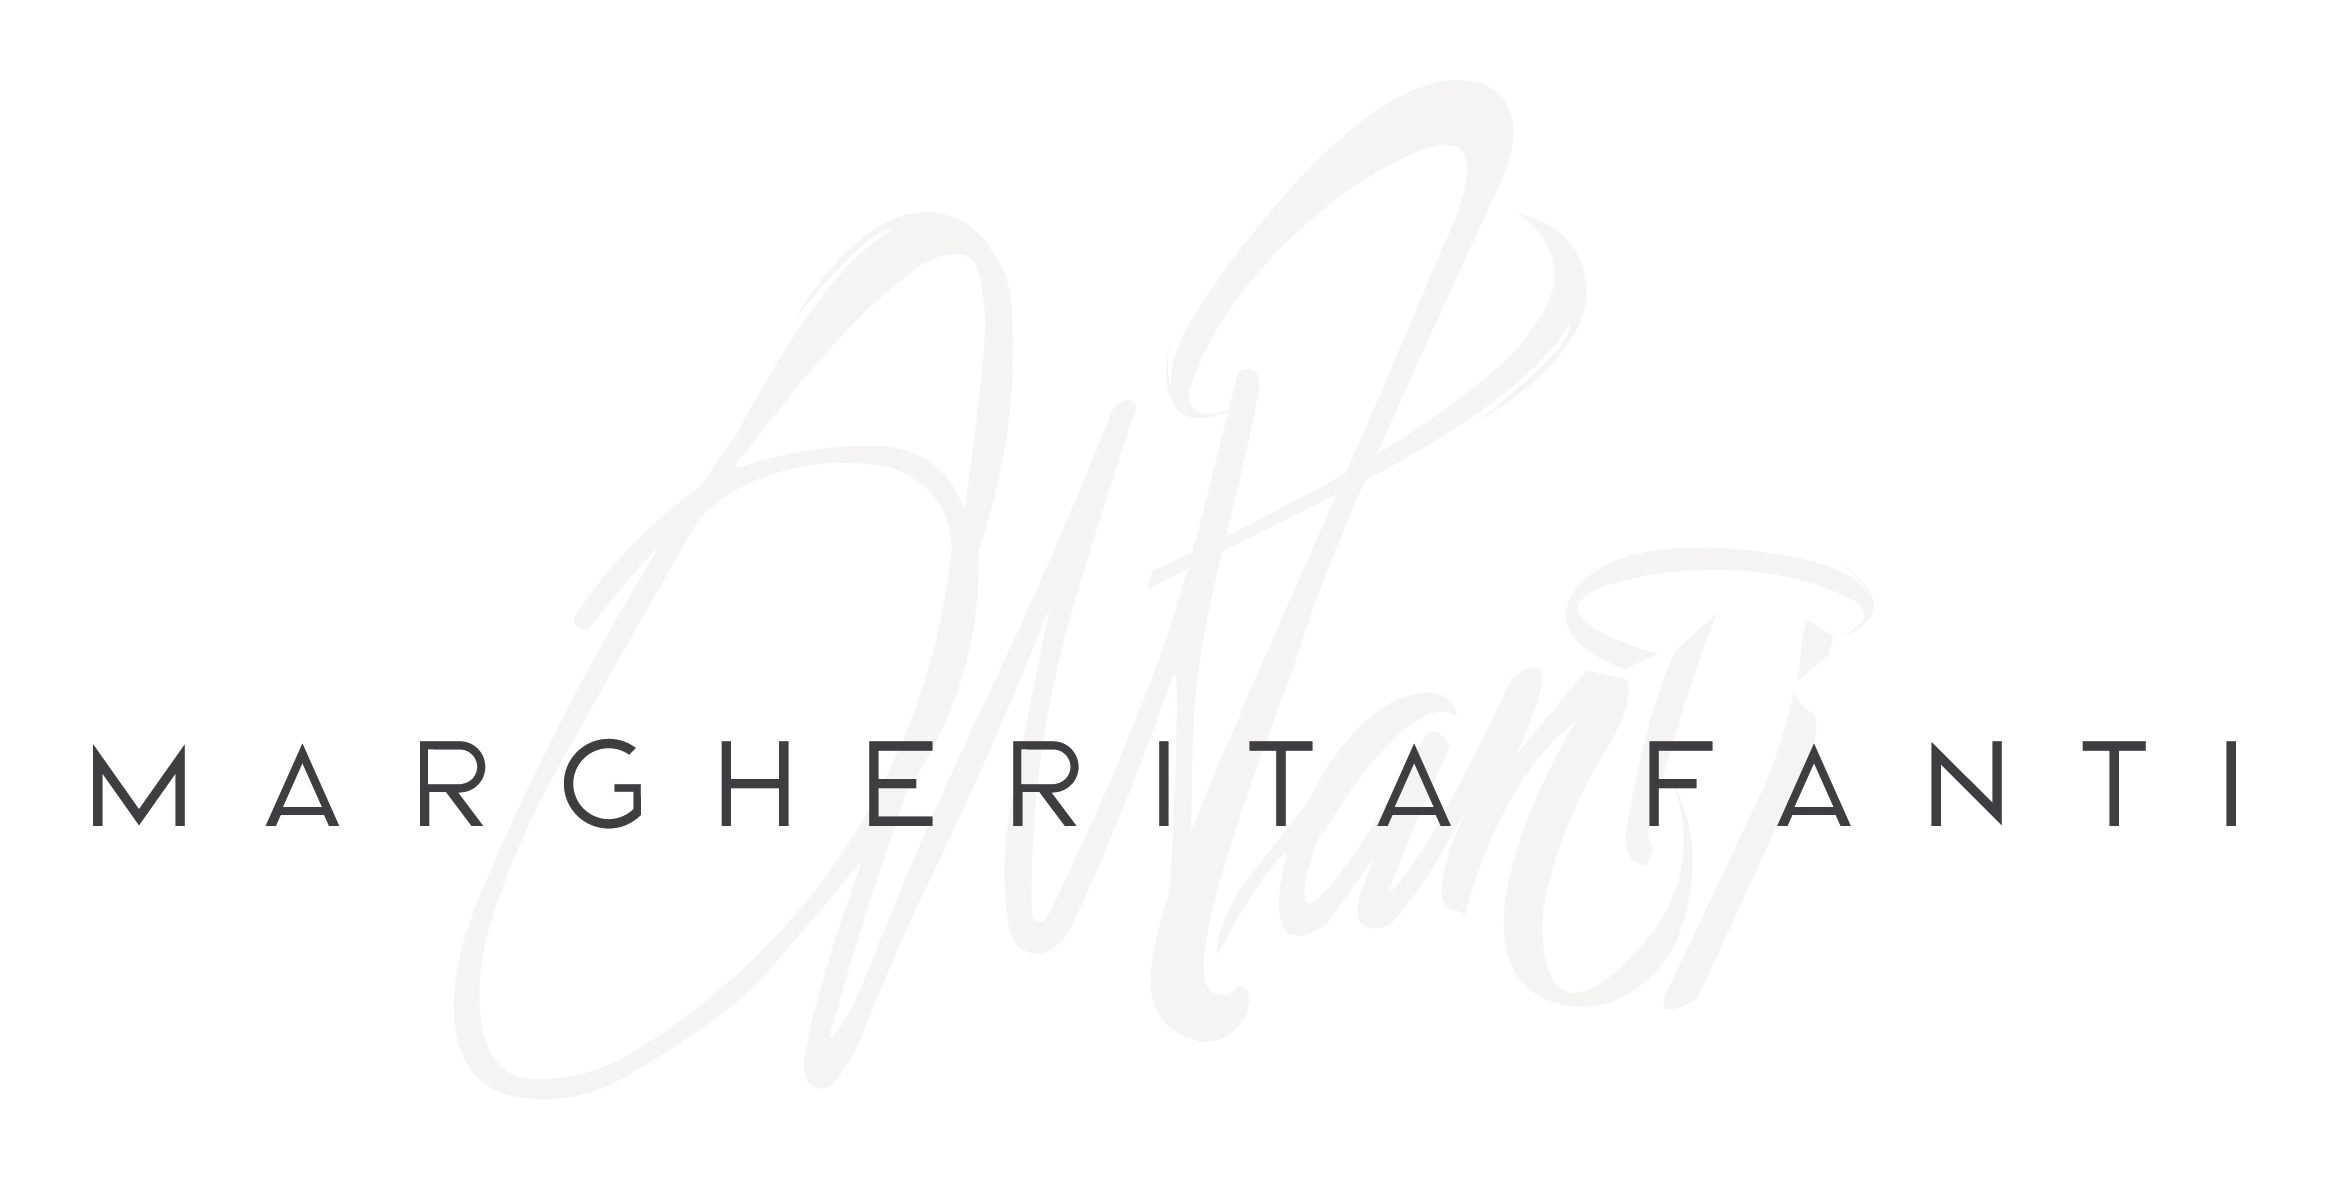 Margherita Fanti